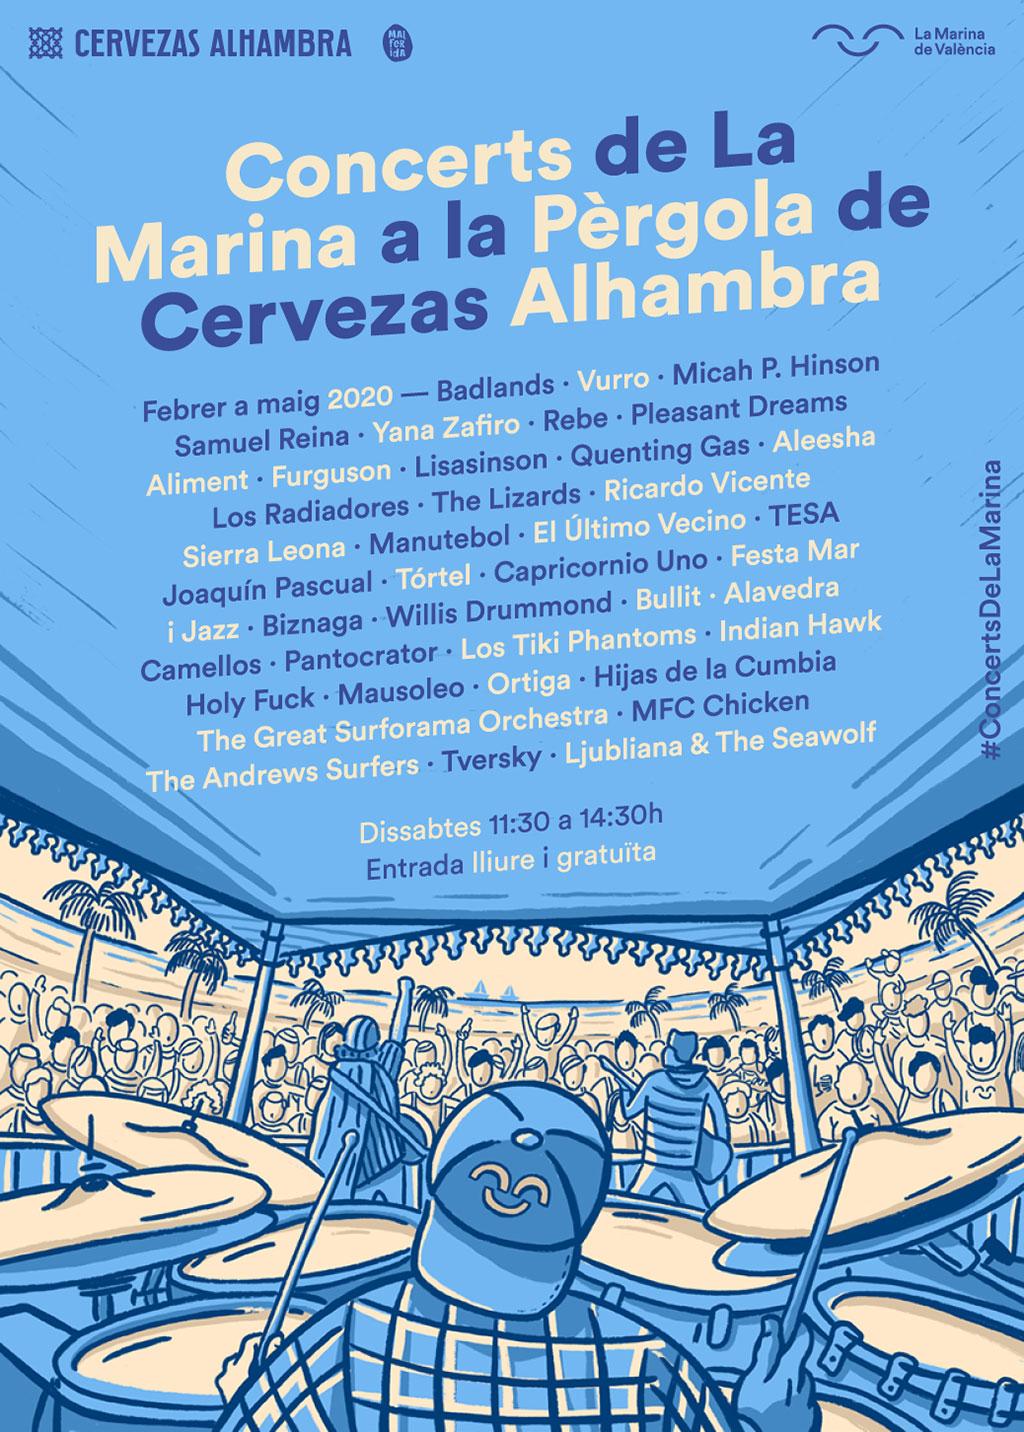 Conciertos La Pérgola 2020: Программа